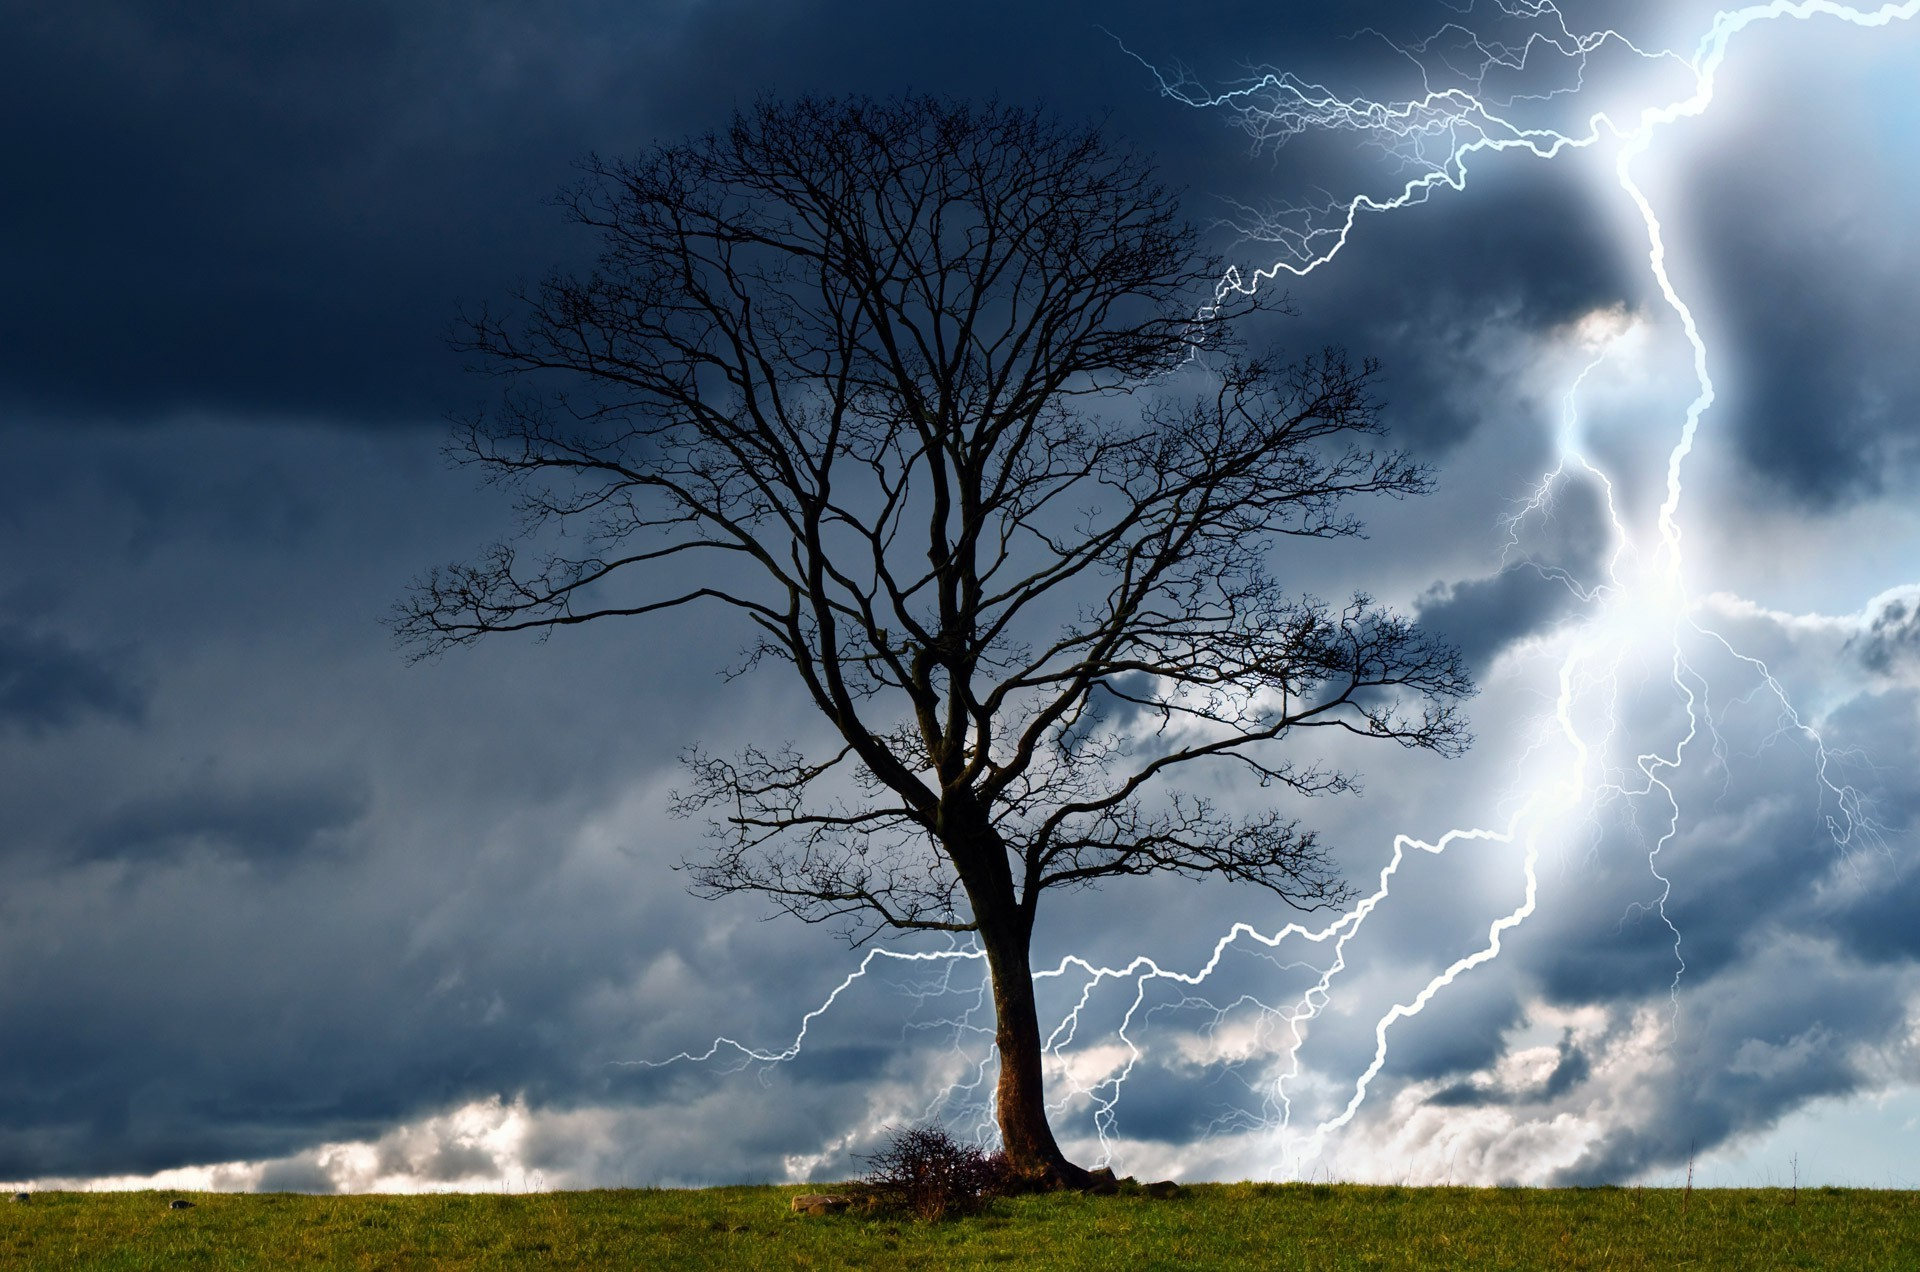 Rain Storm Desktop Wallpaper 49 Images